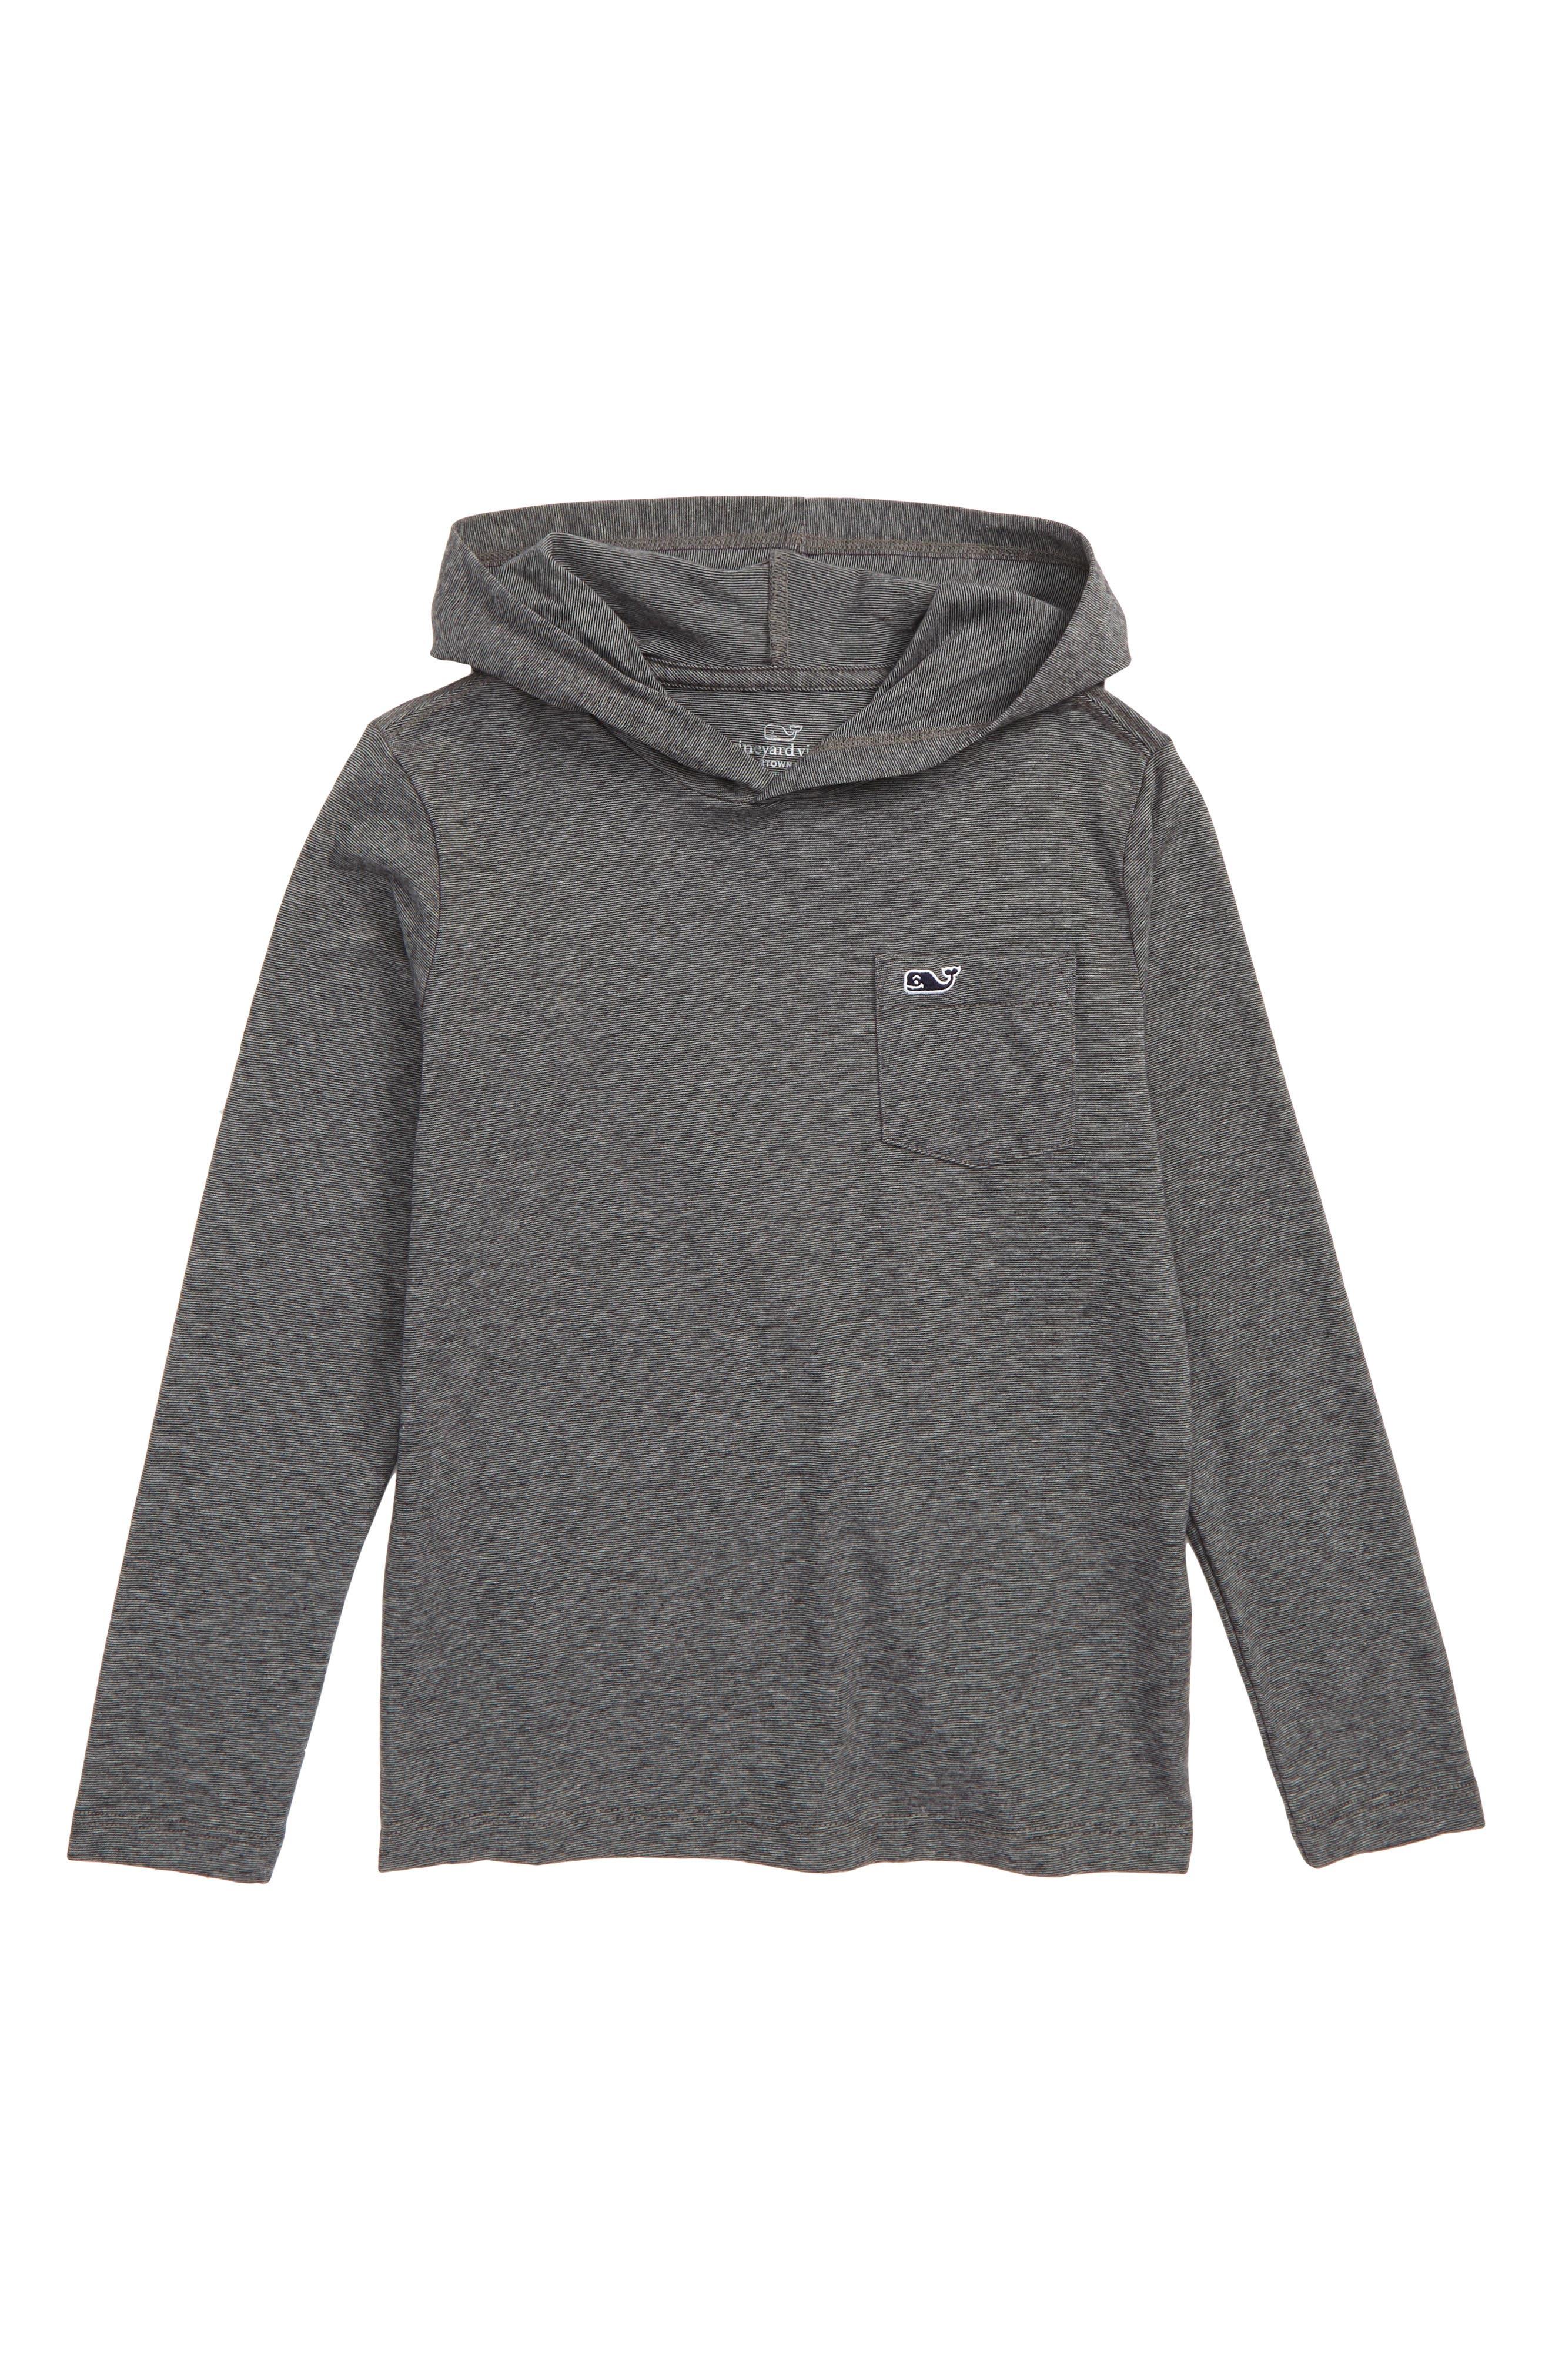 Boys Vineyard Vines Edgartown Performance Hooded TShirt Size 6  Grey